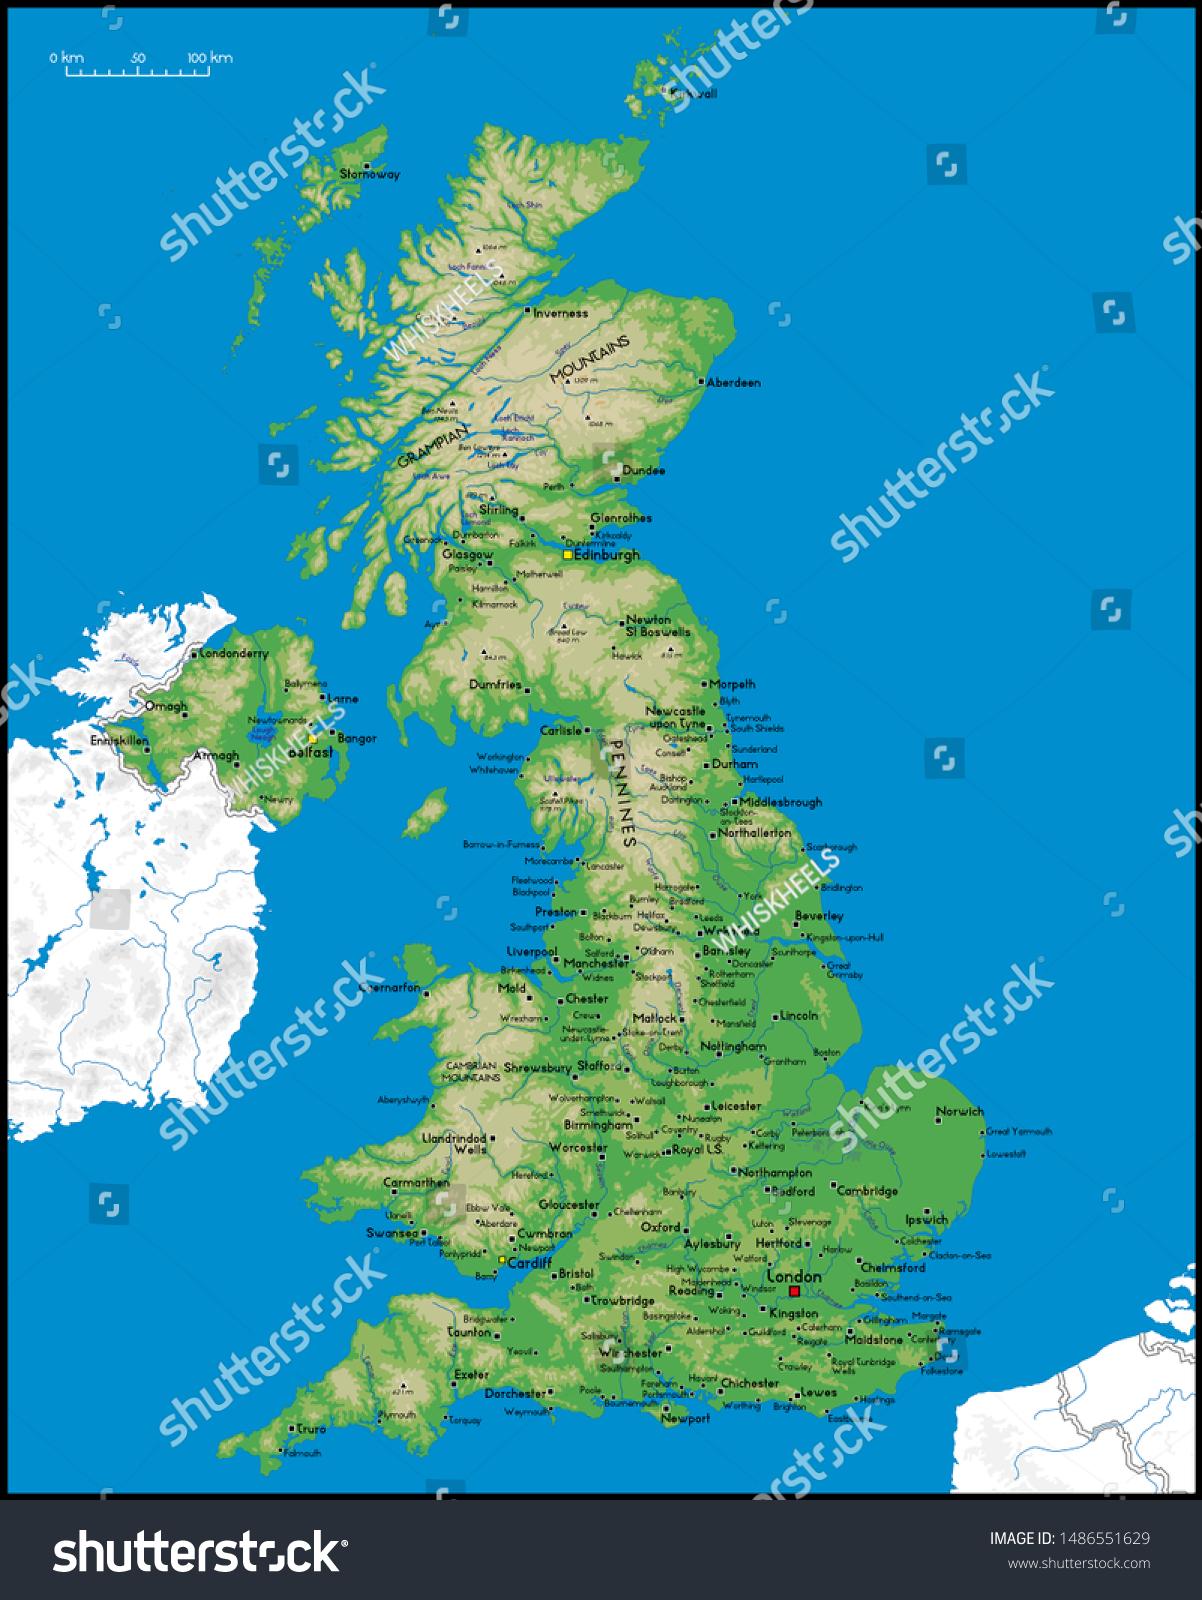 Picture of: Vector De Stock Libre De Regalias Sobre High Detailed United Kingdom Physical Map1486551629